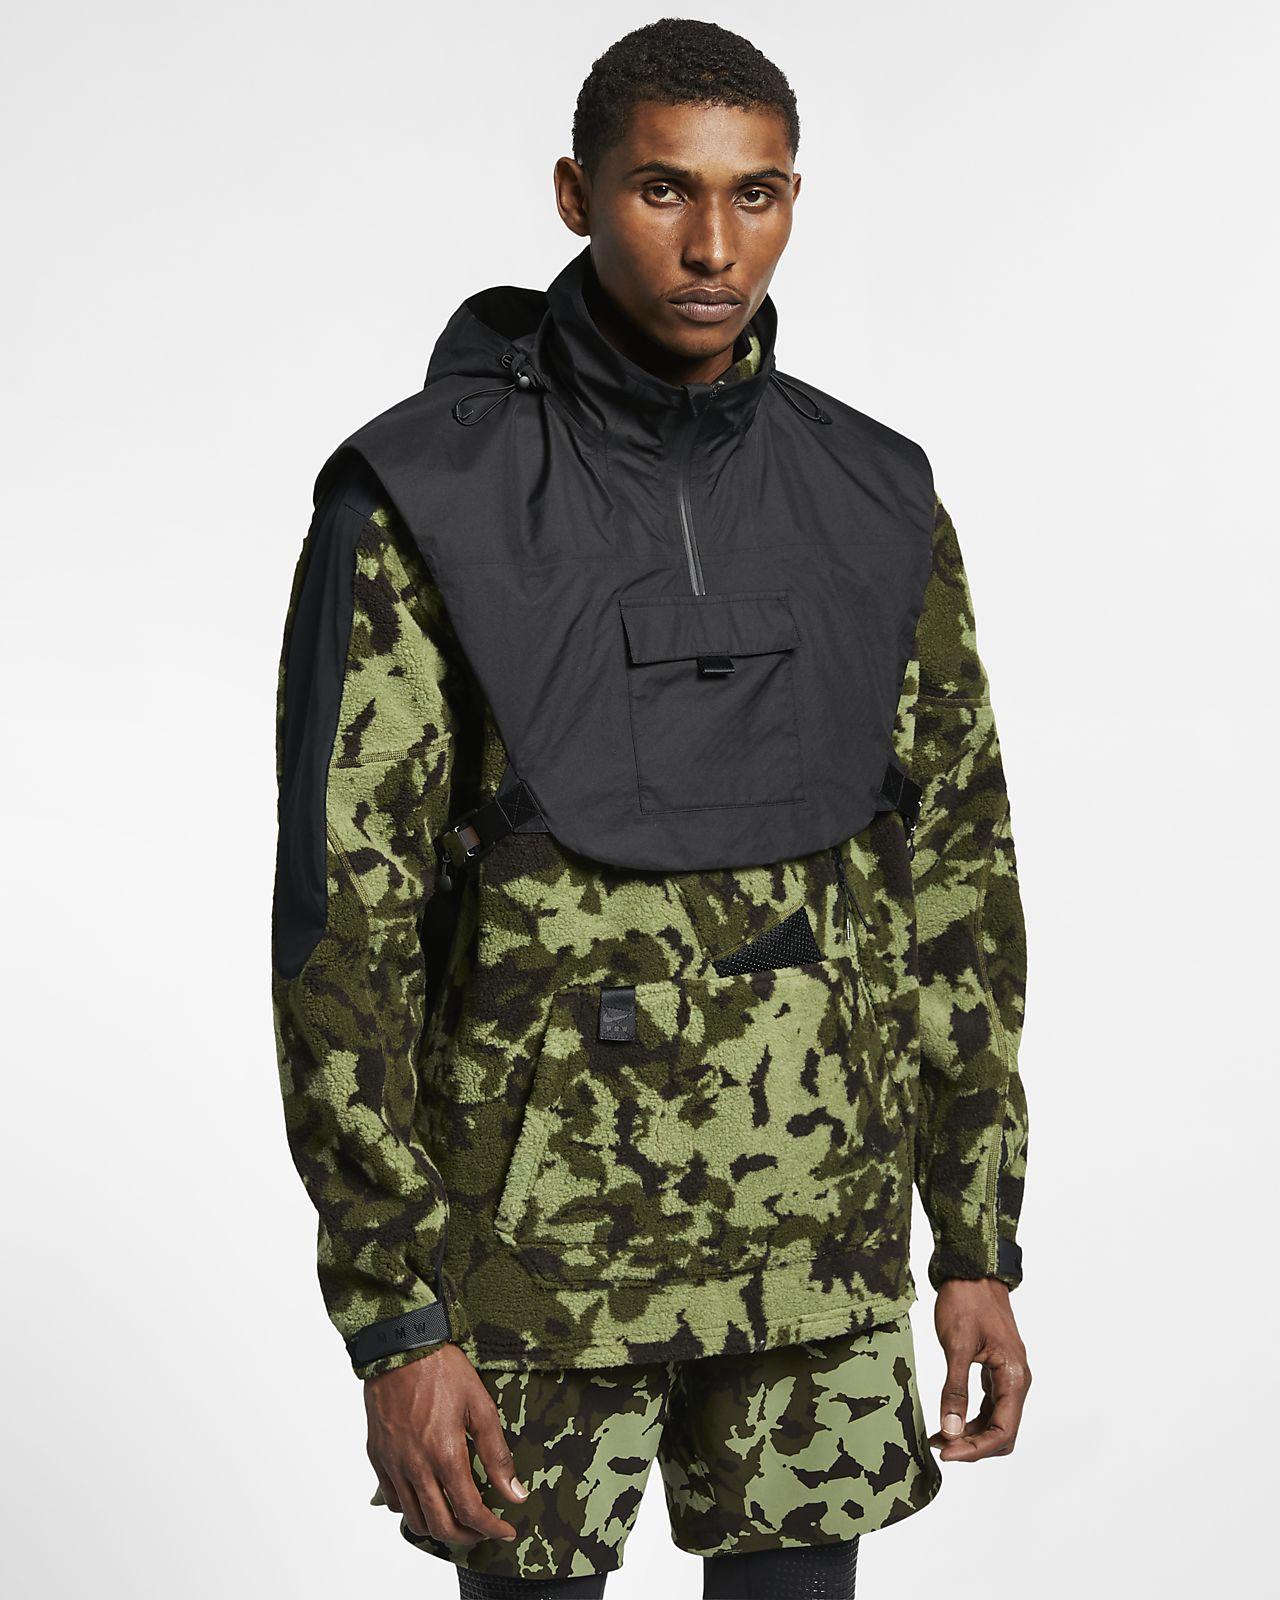 Nike x MMW Men's Hooded Fleece Jacket